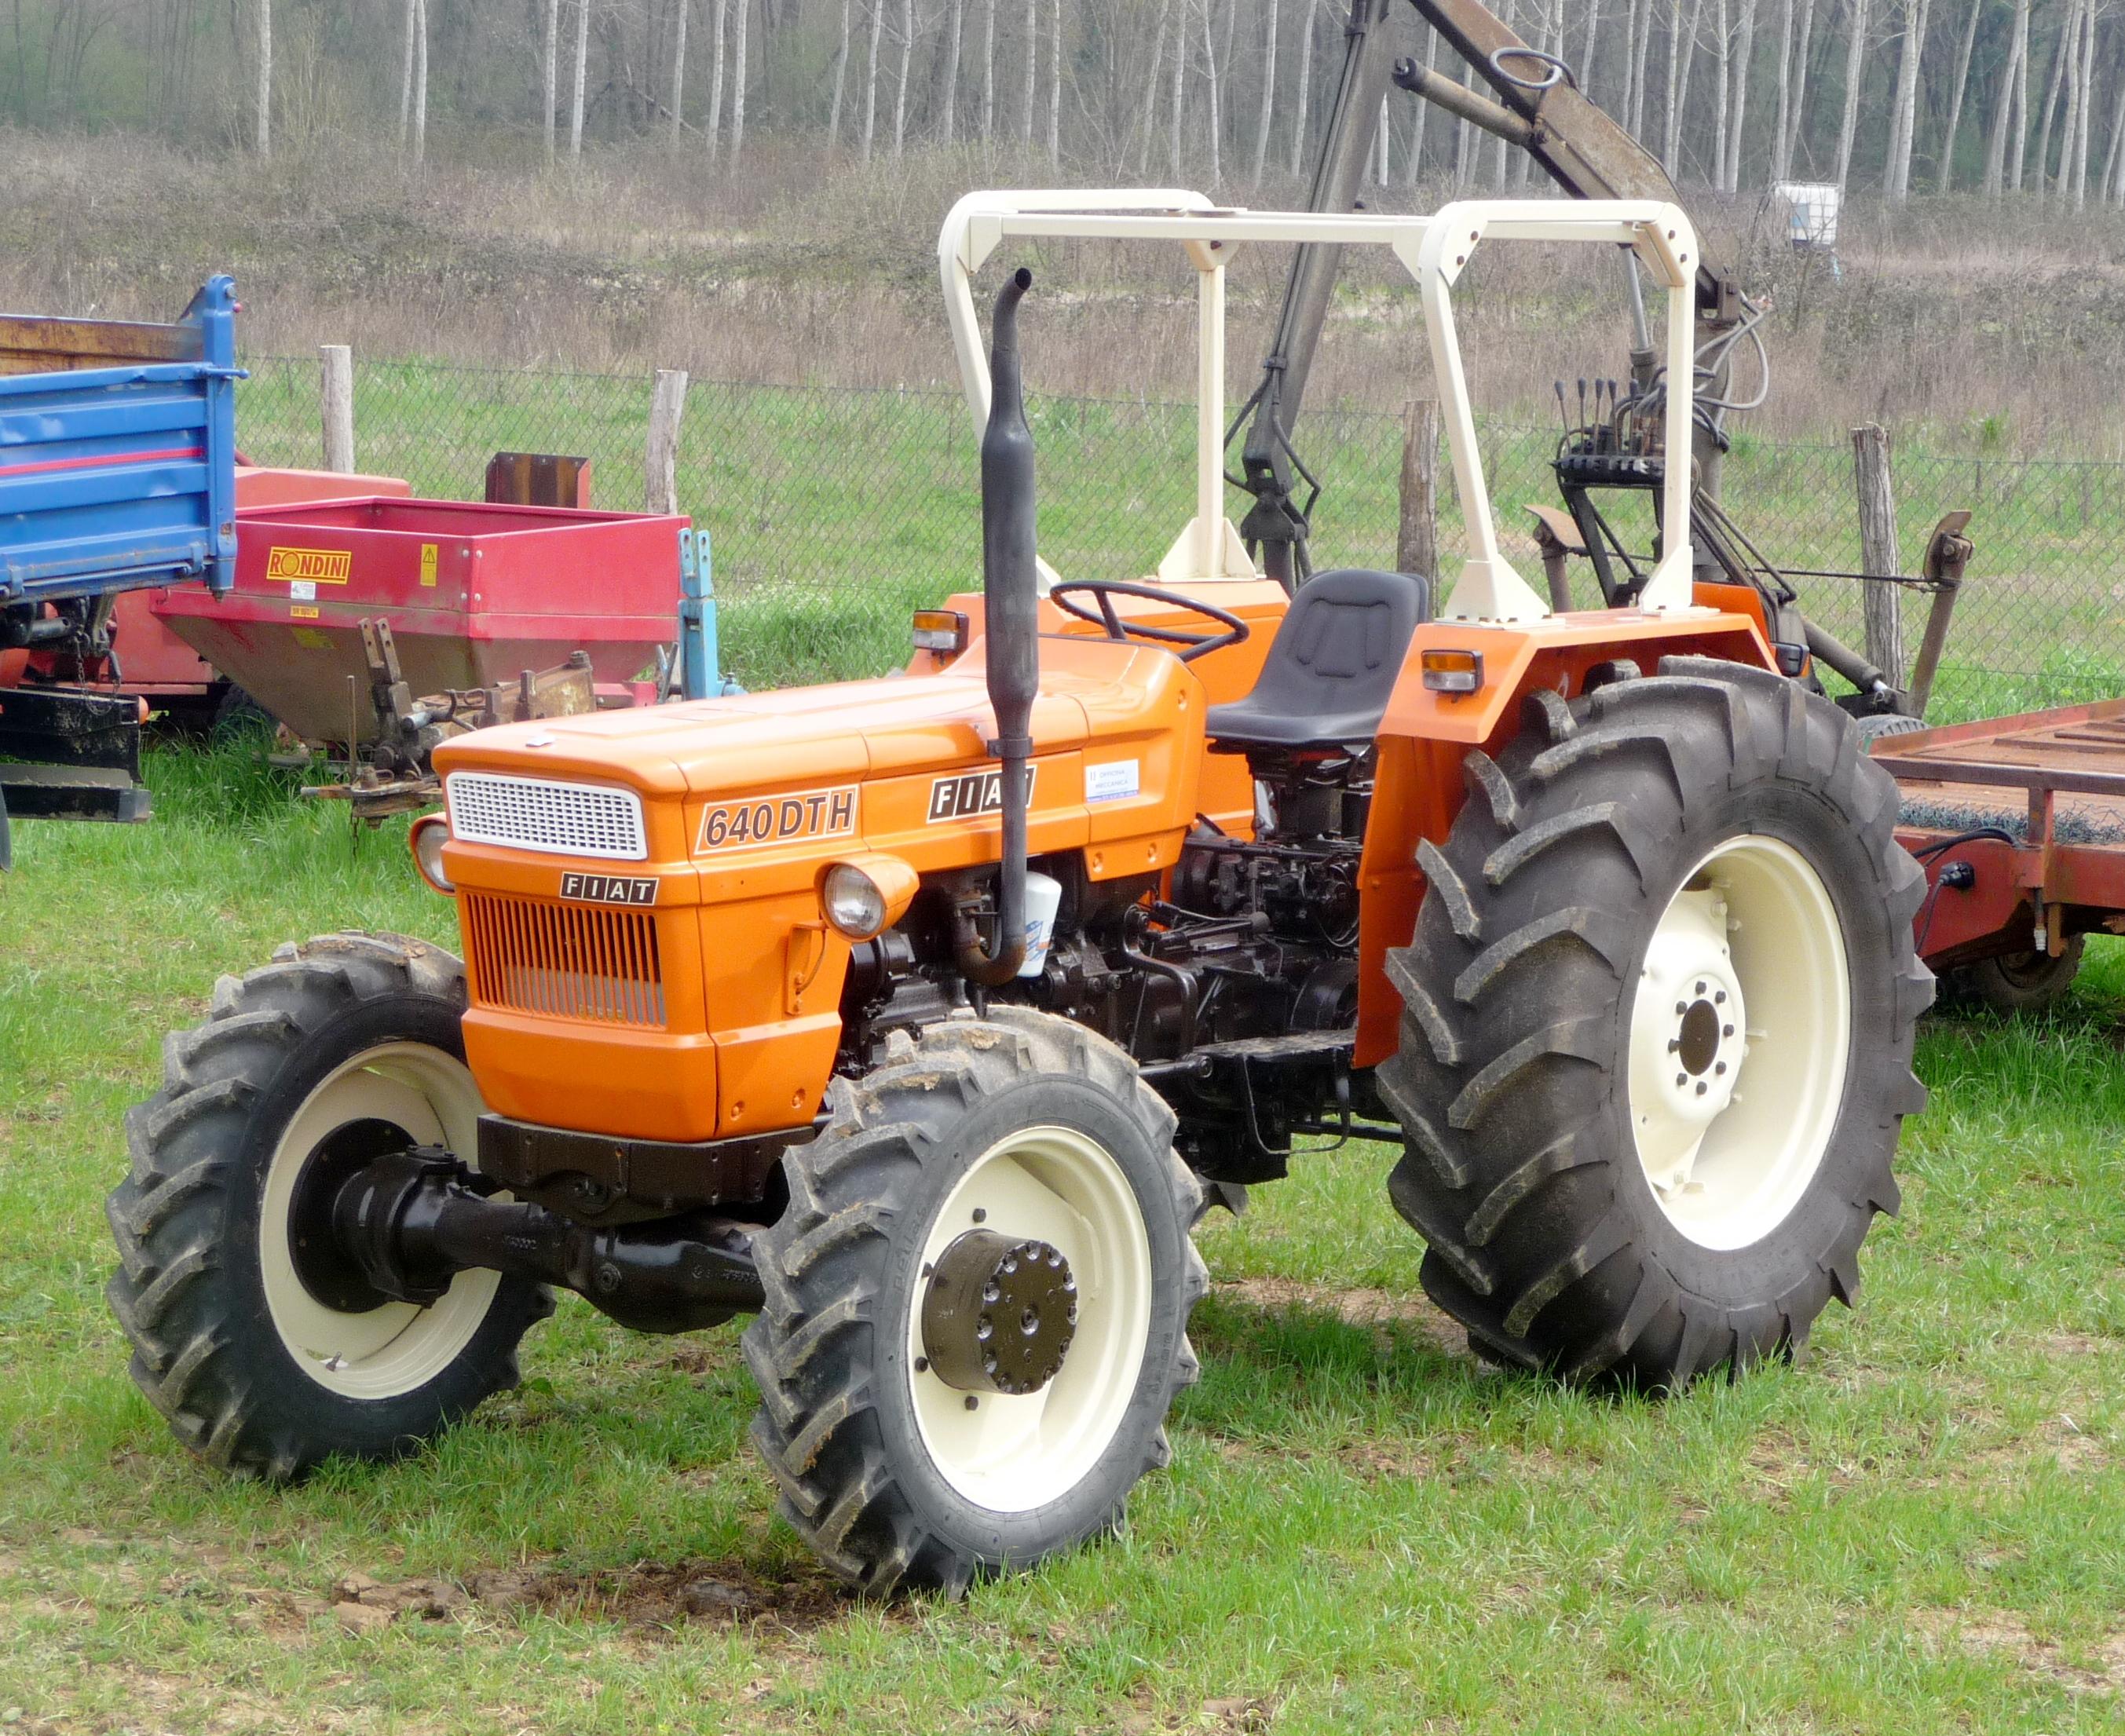 Fabelhaft File:Fiat 640 DTH tractor.jpg - Wikimedia Commons @MO_56